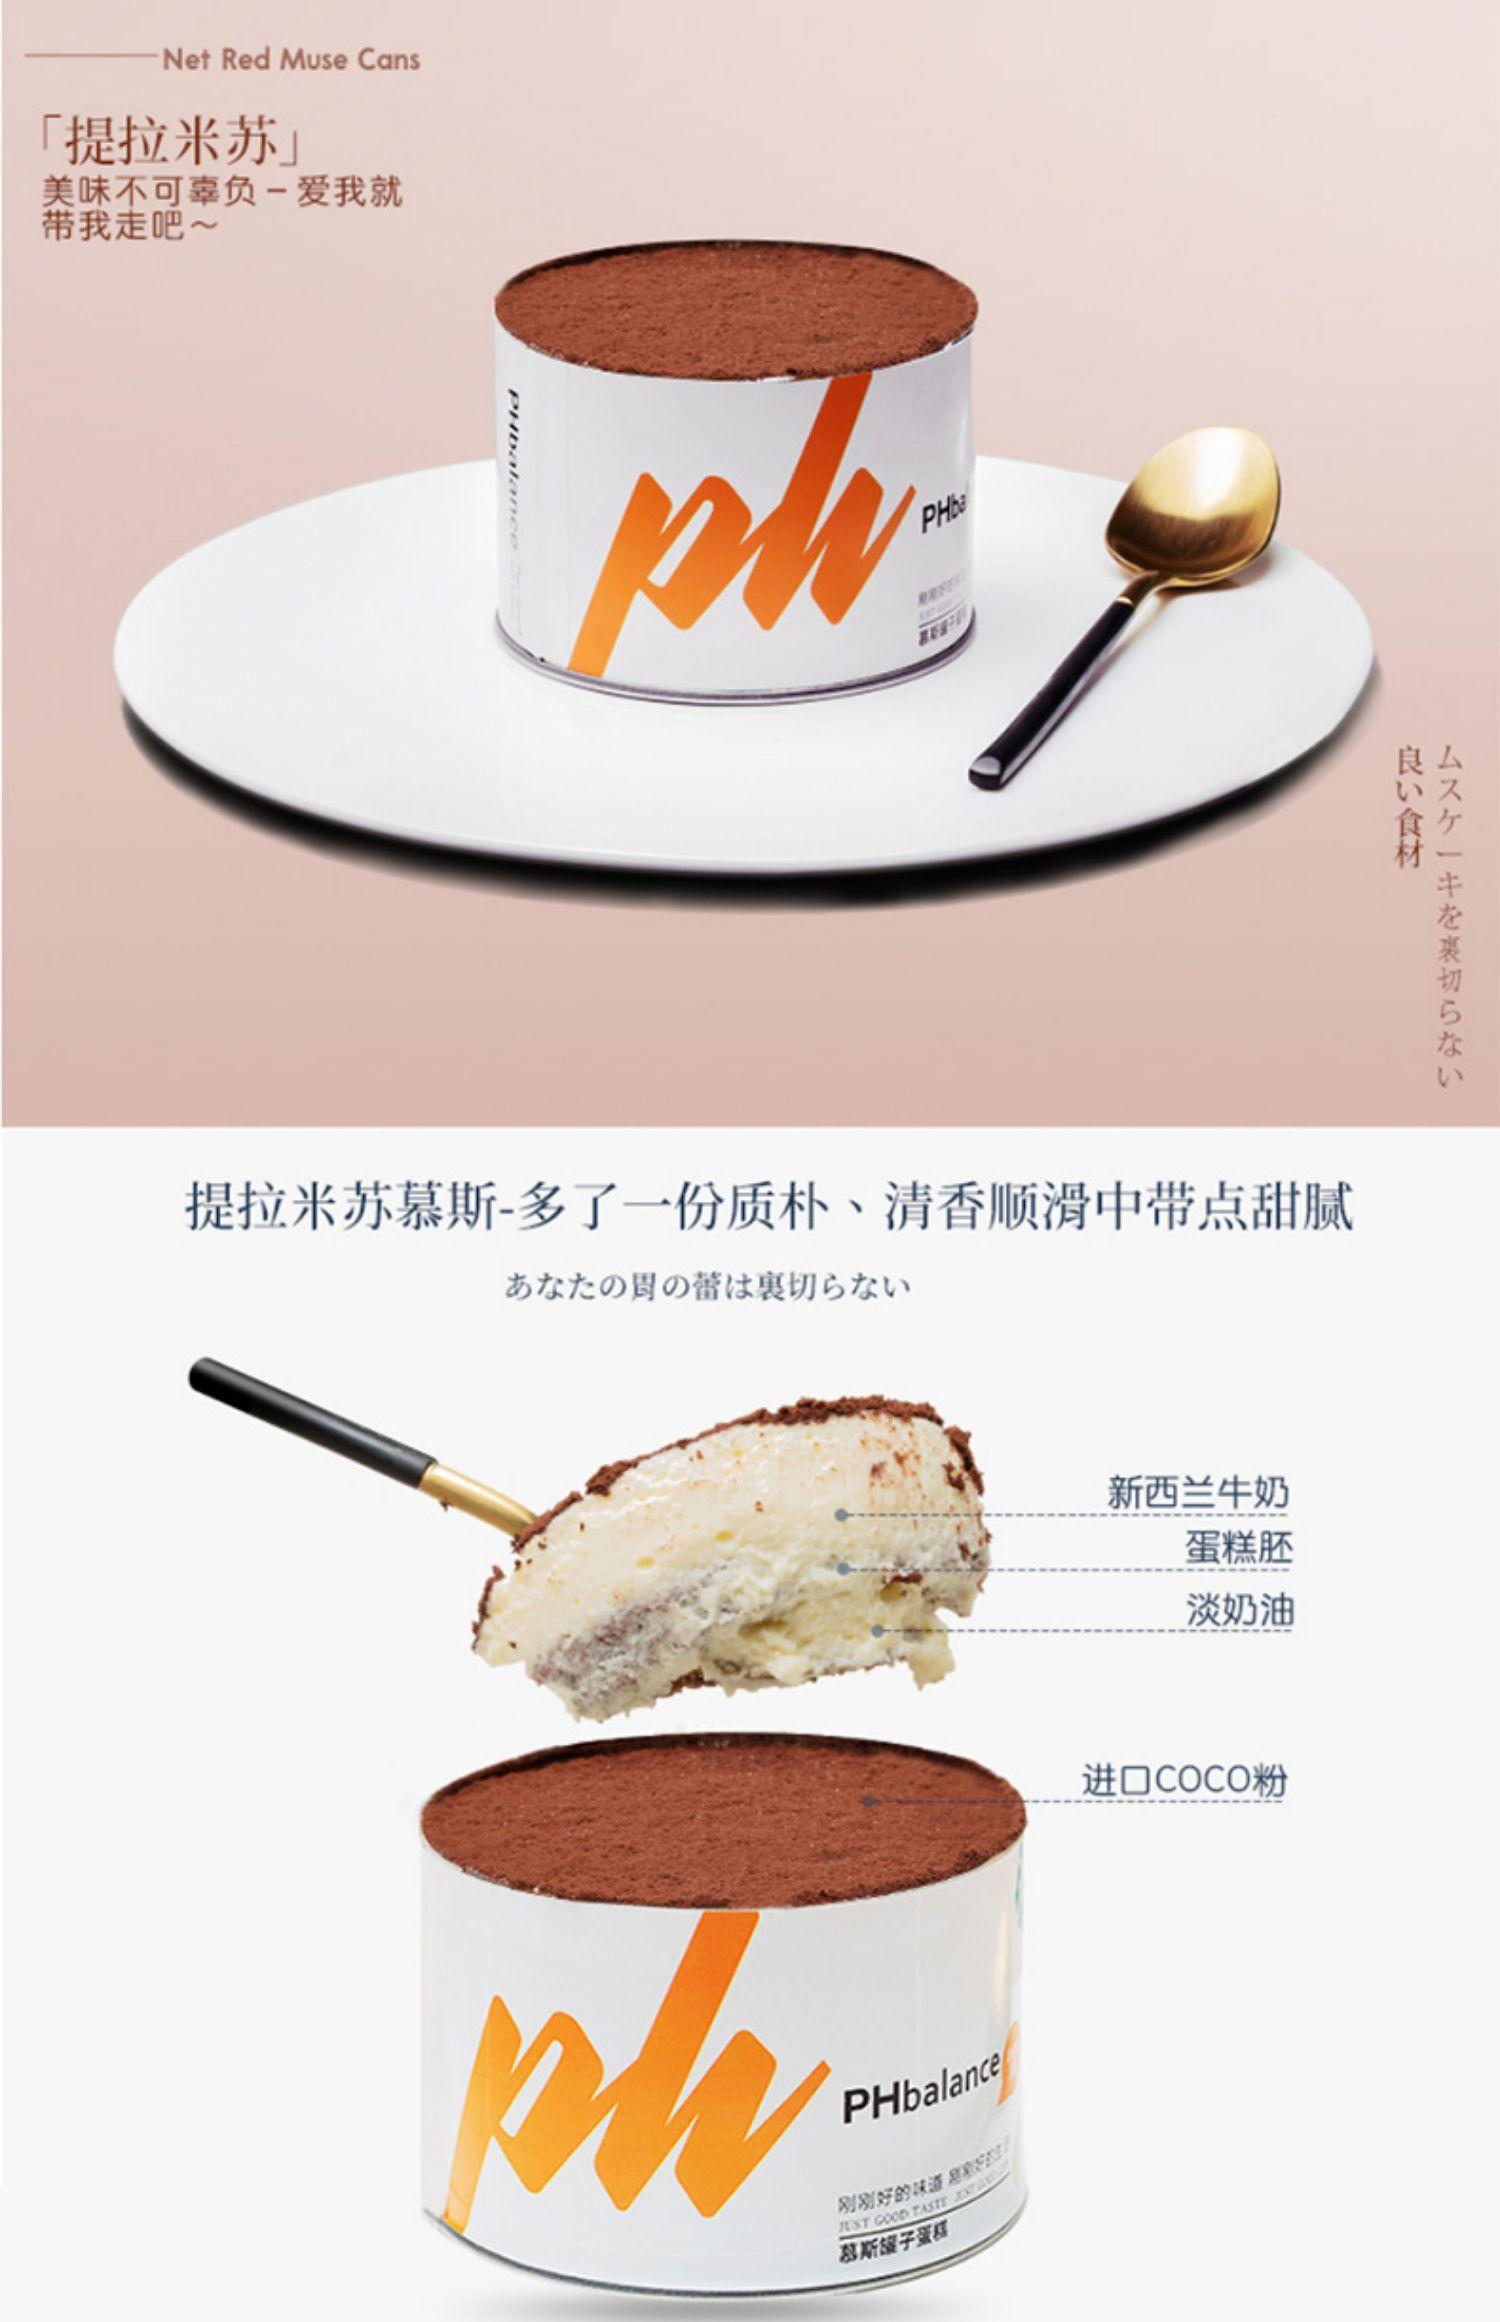 【PHbalance】网红慕斯小蛋糕甜品